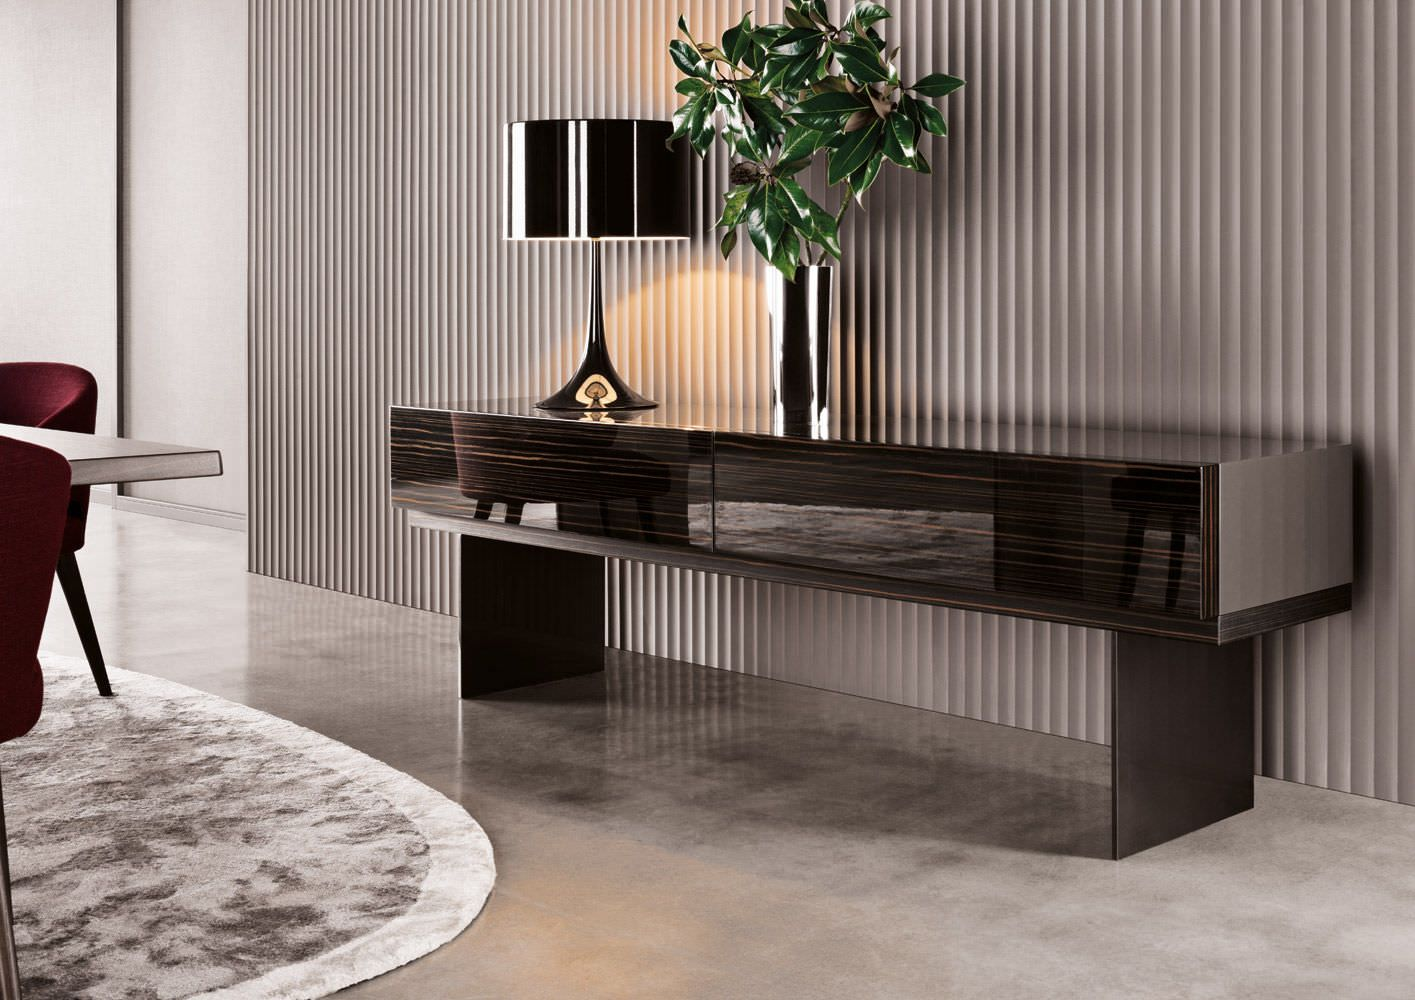 Minotti Wardrobe Google Search Minotti Sideboards Living Room